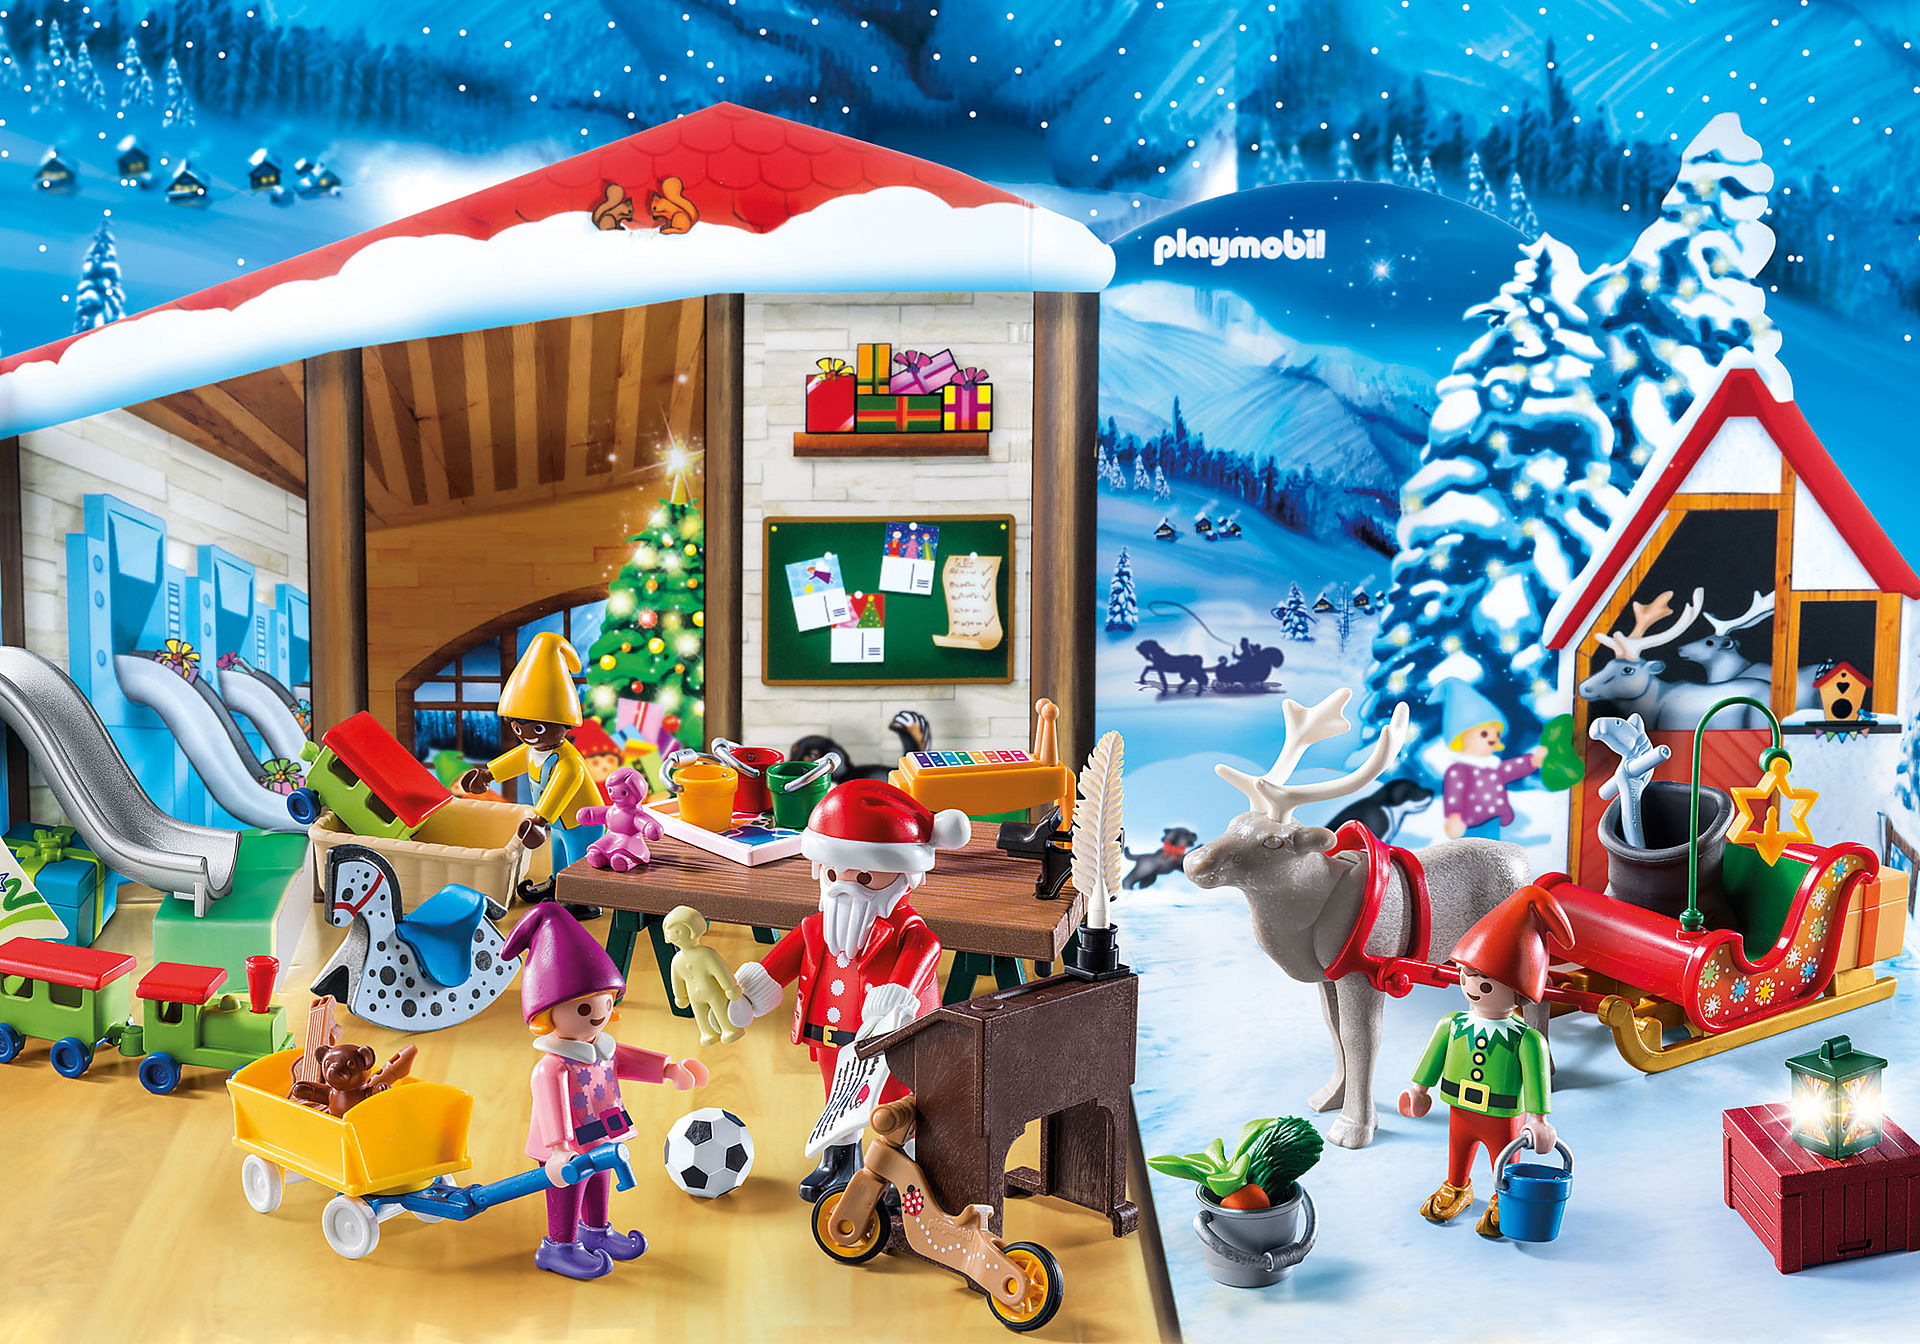 http://media.playmobil.com/i/playmobil/9264_product_extra1/Advent Calendar - Santa's Workshop